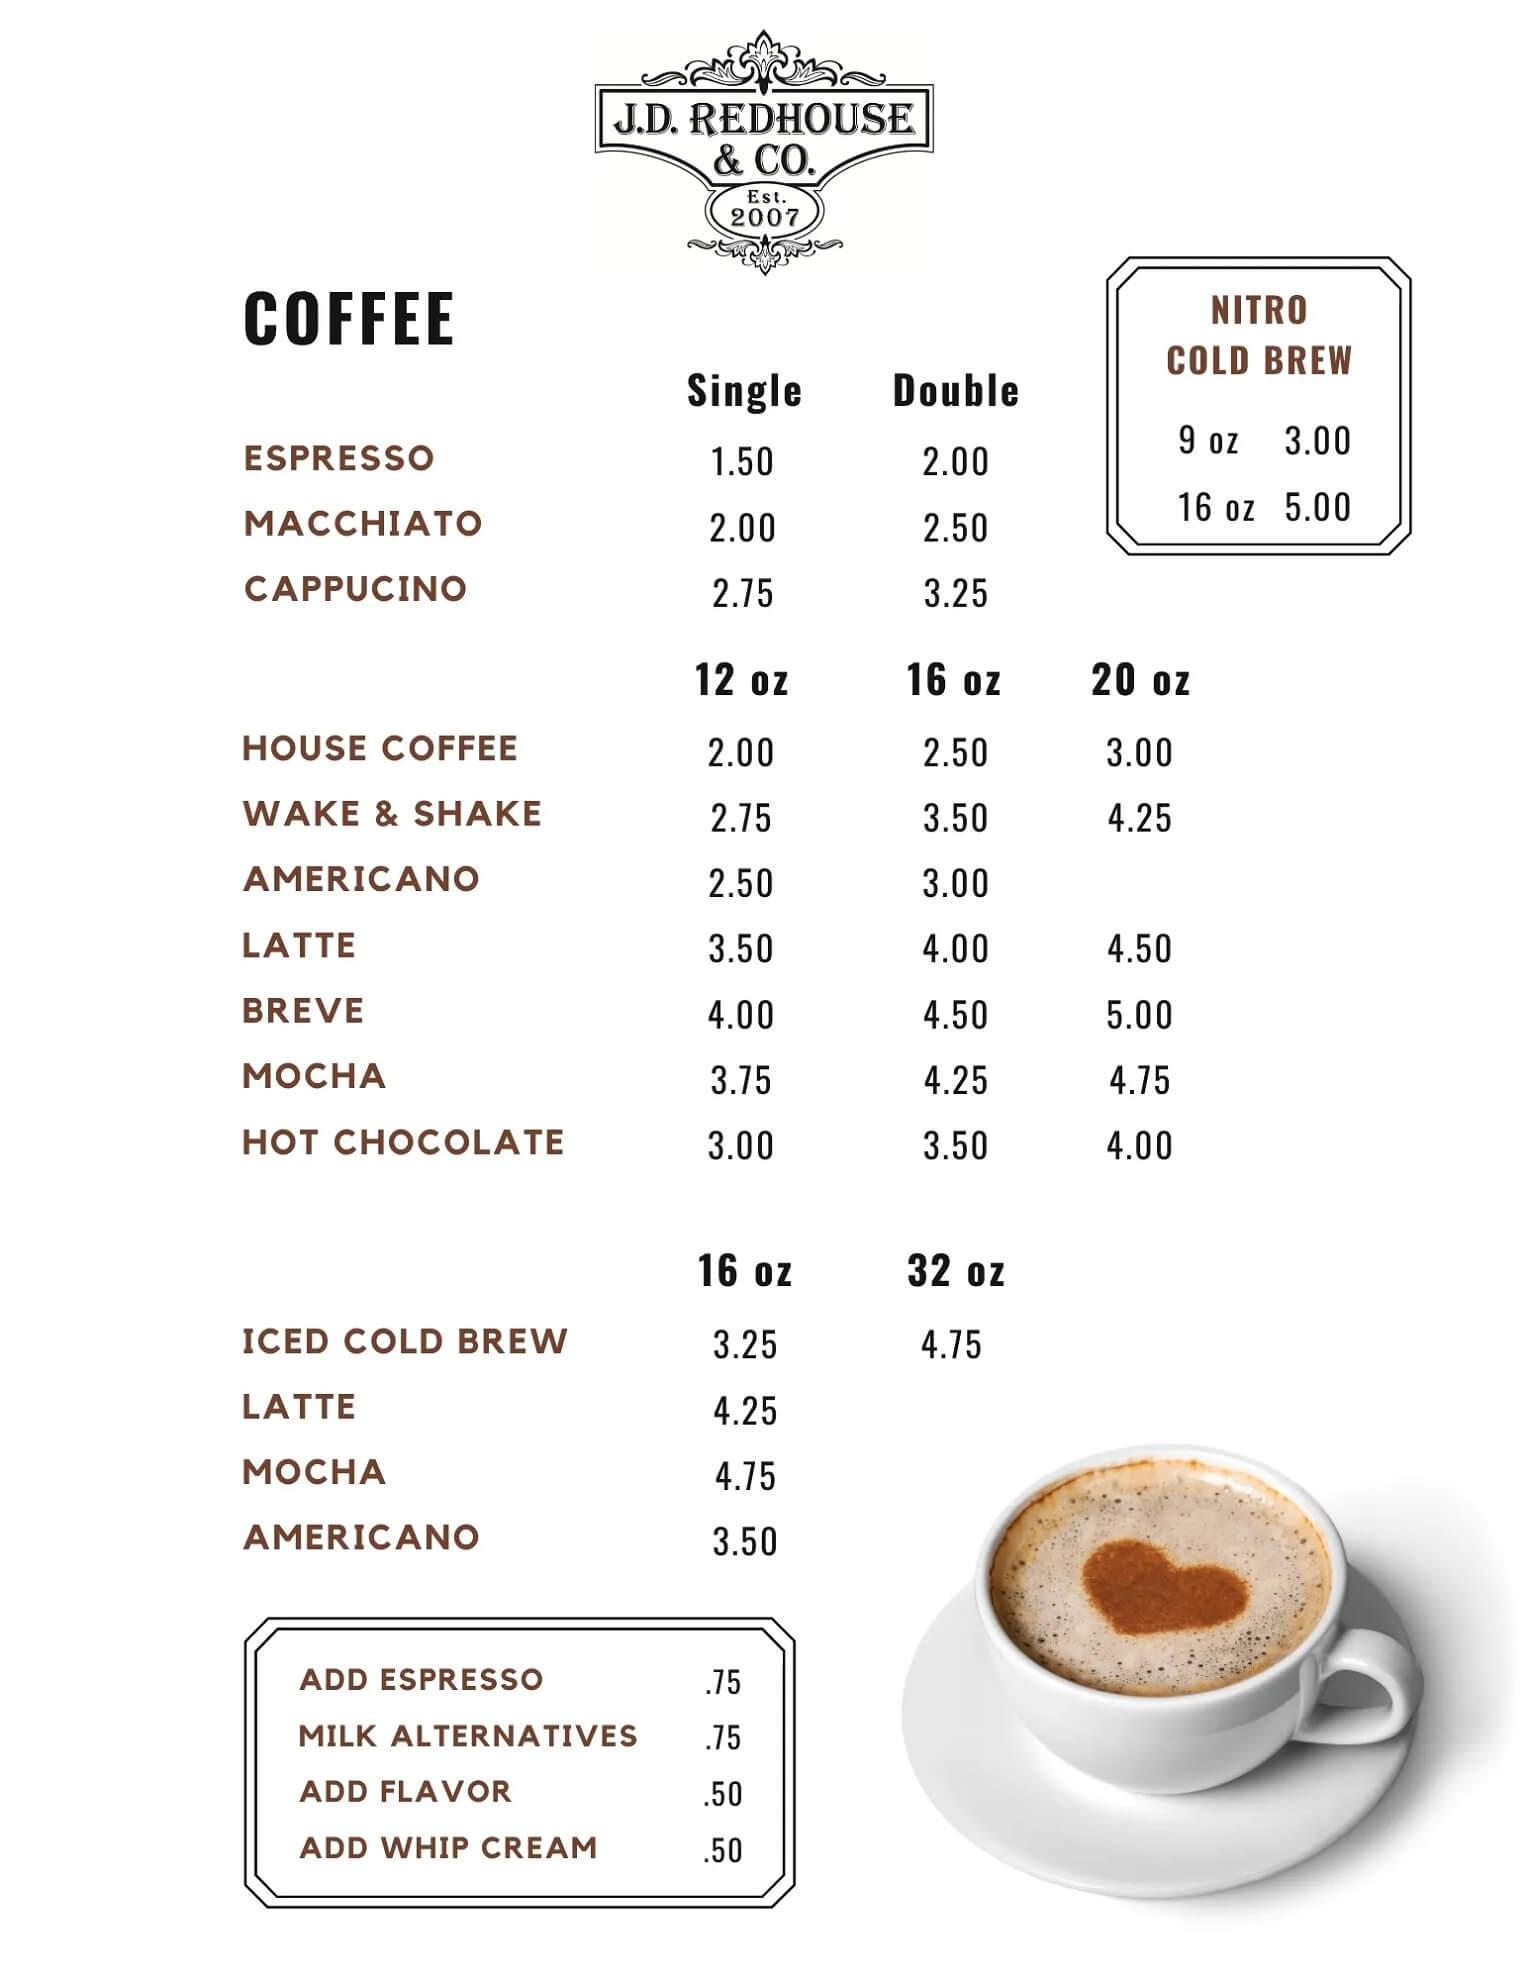 JD Redhouse Coffee Menu - Willits California